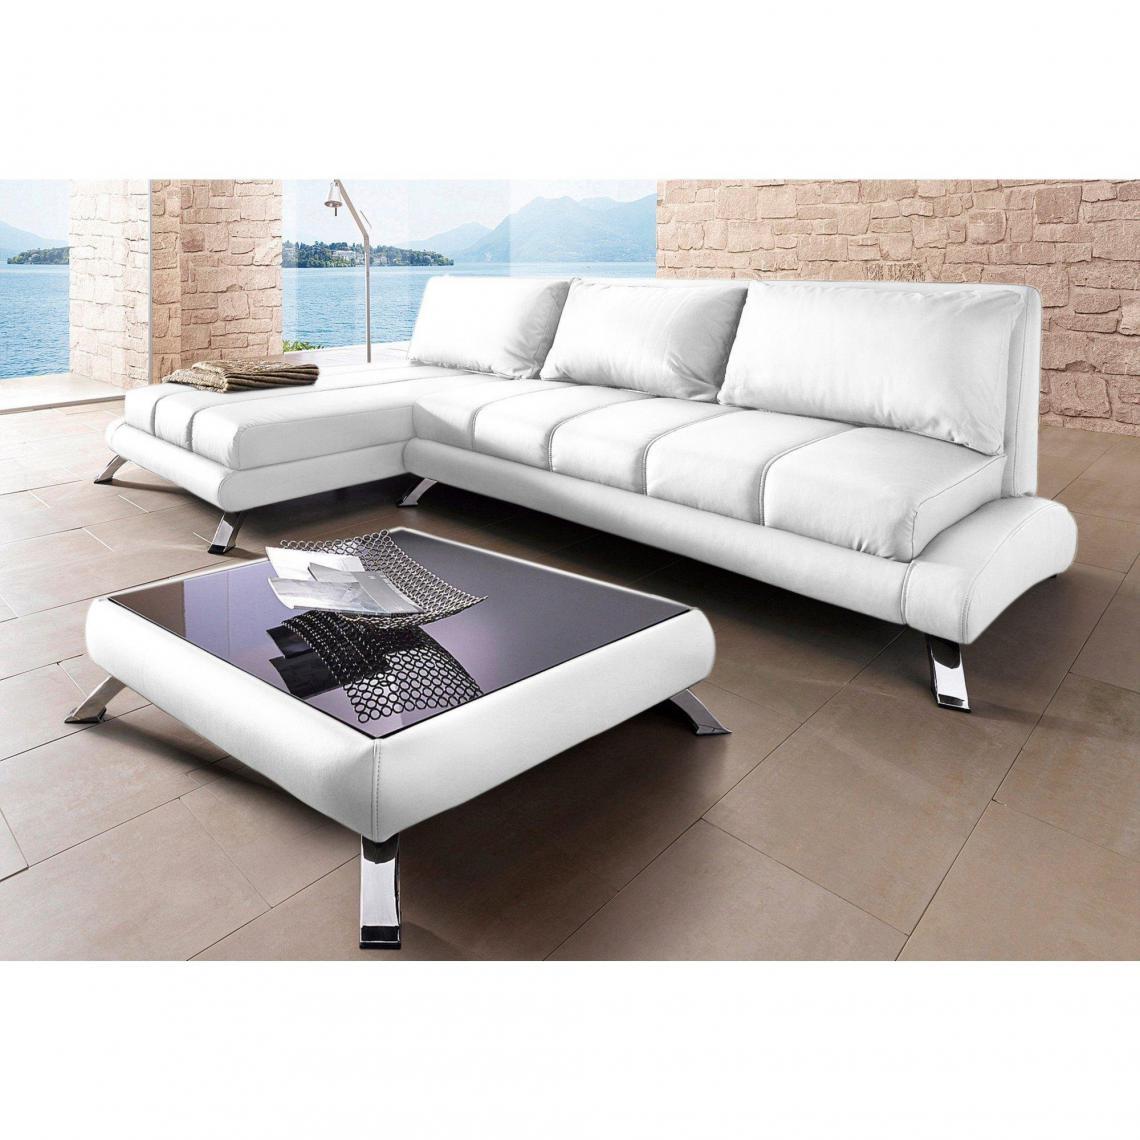 table basse carr e rev tement synth tique et pieds m tal. Black Bedroom Furniture Sets. Home Design Ideas